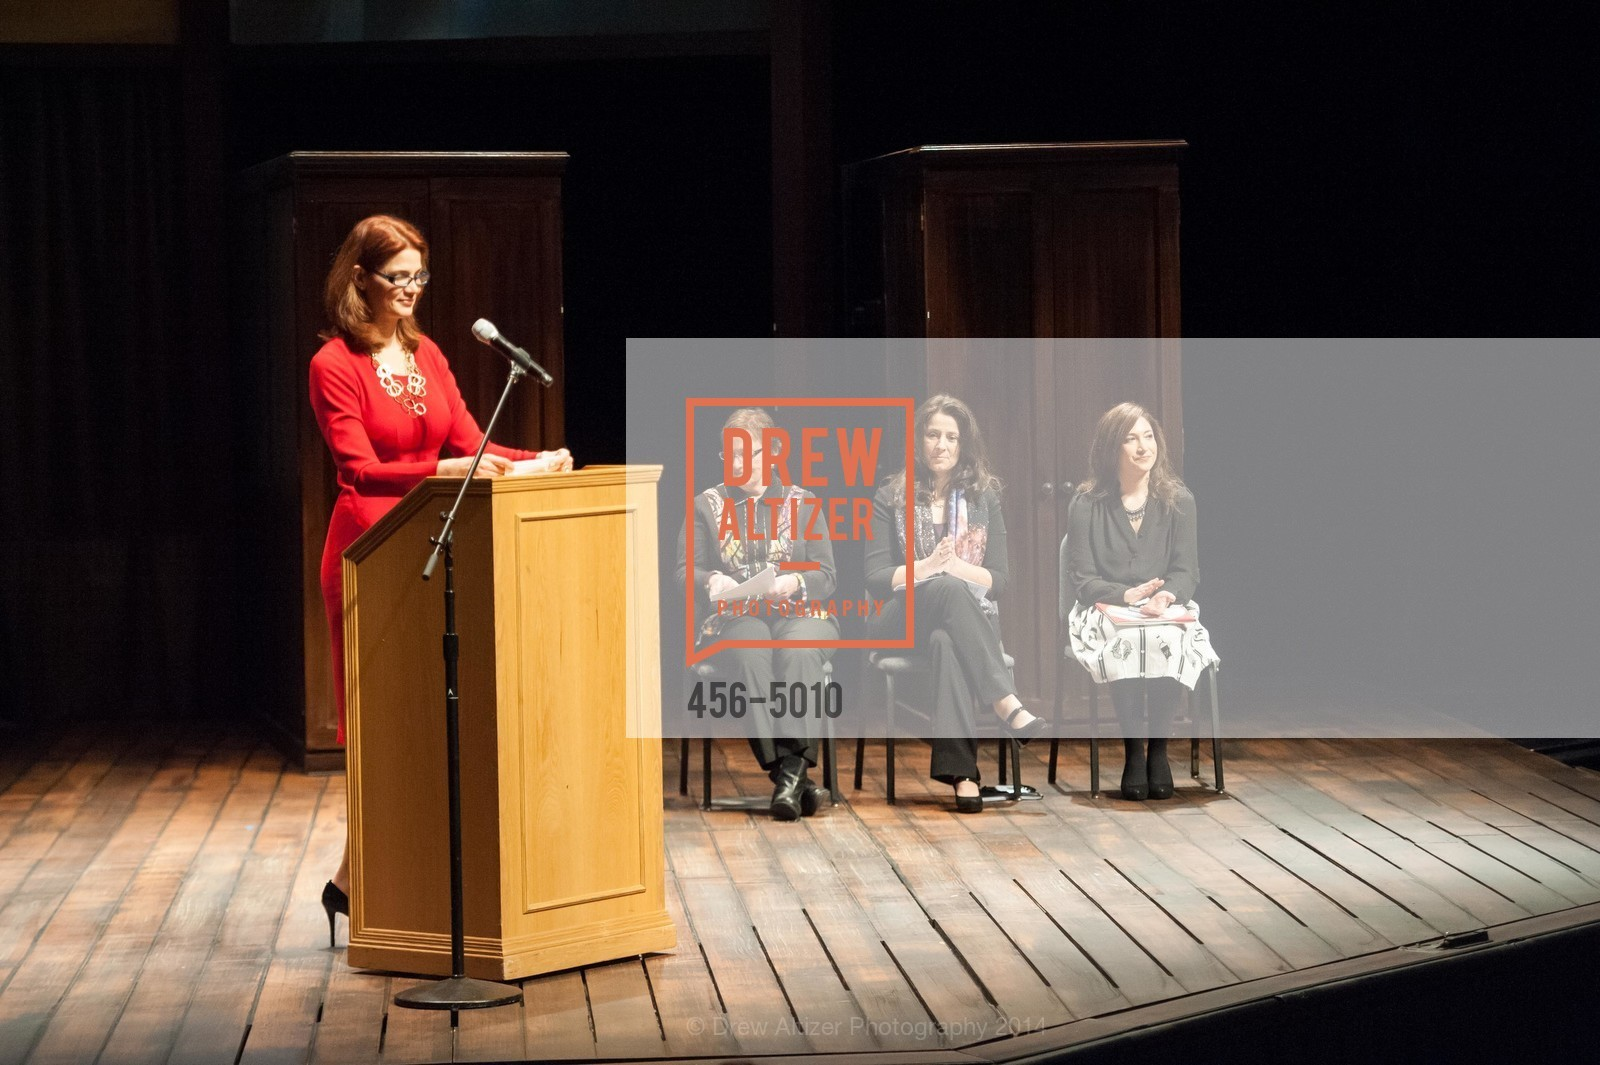 Jenny Dearborn, Ann Bowers, Natalie Batalha, Randi Zuckerberg, Photo #456-5010